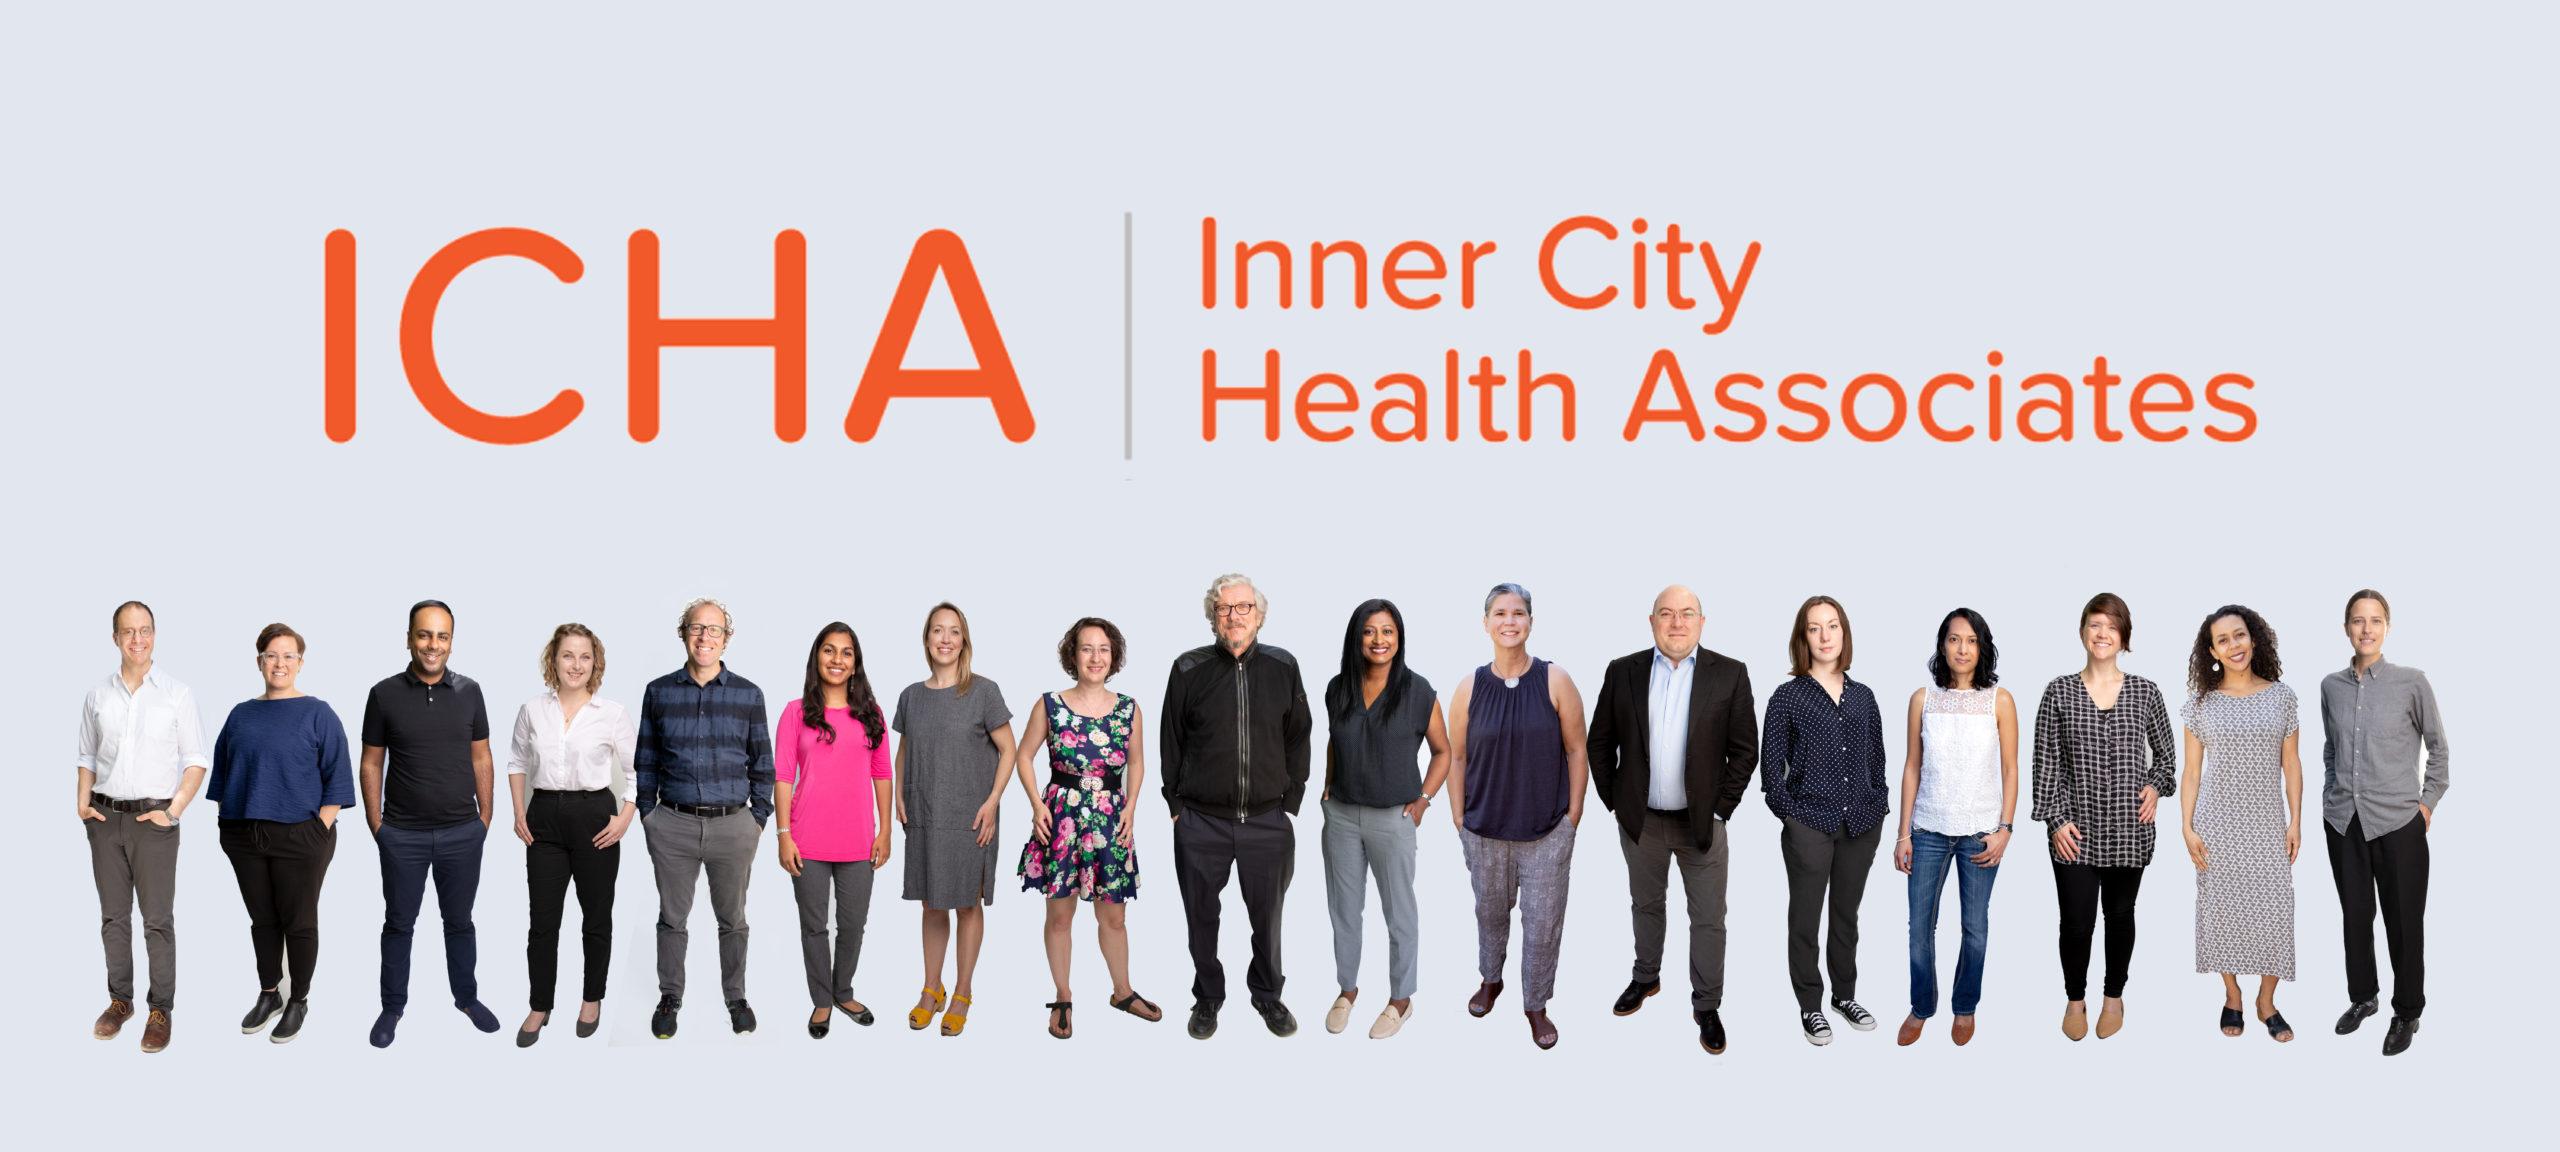 inner-city-health-associates-team-photo